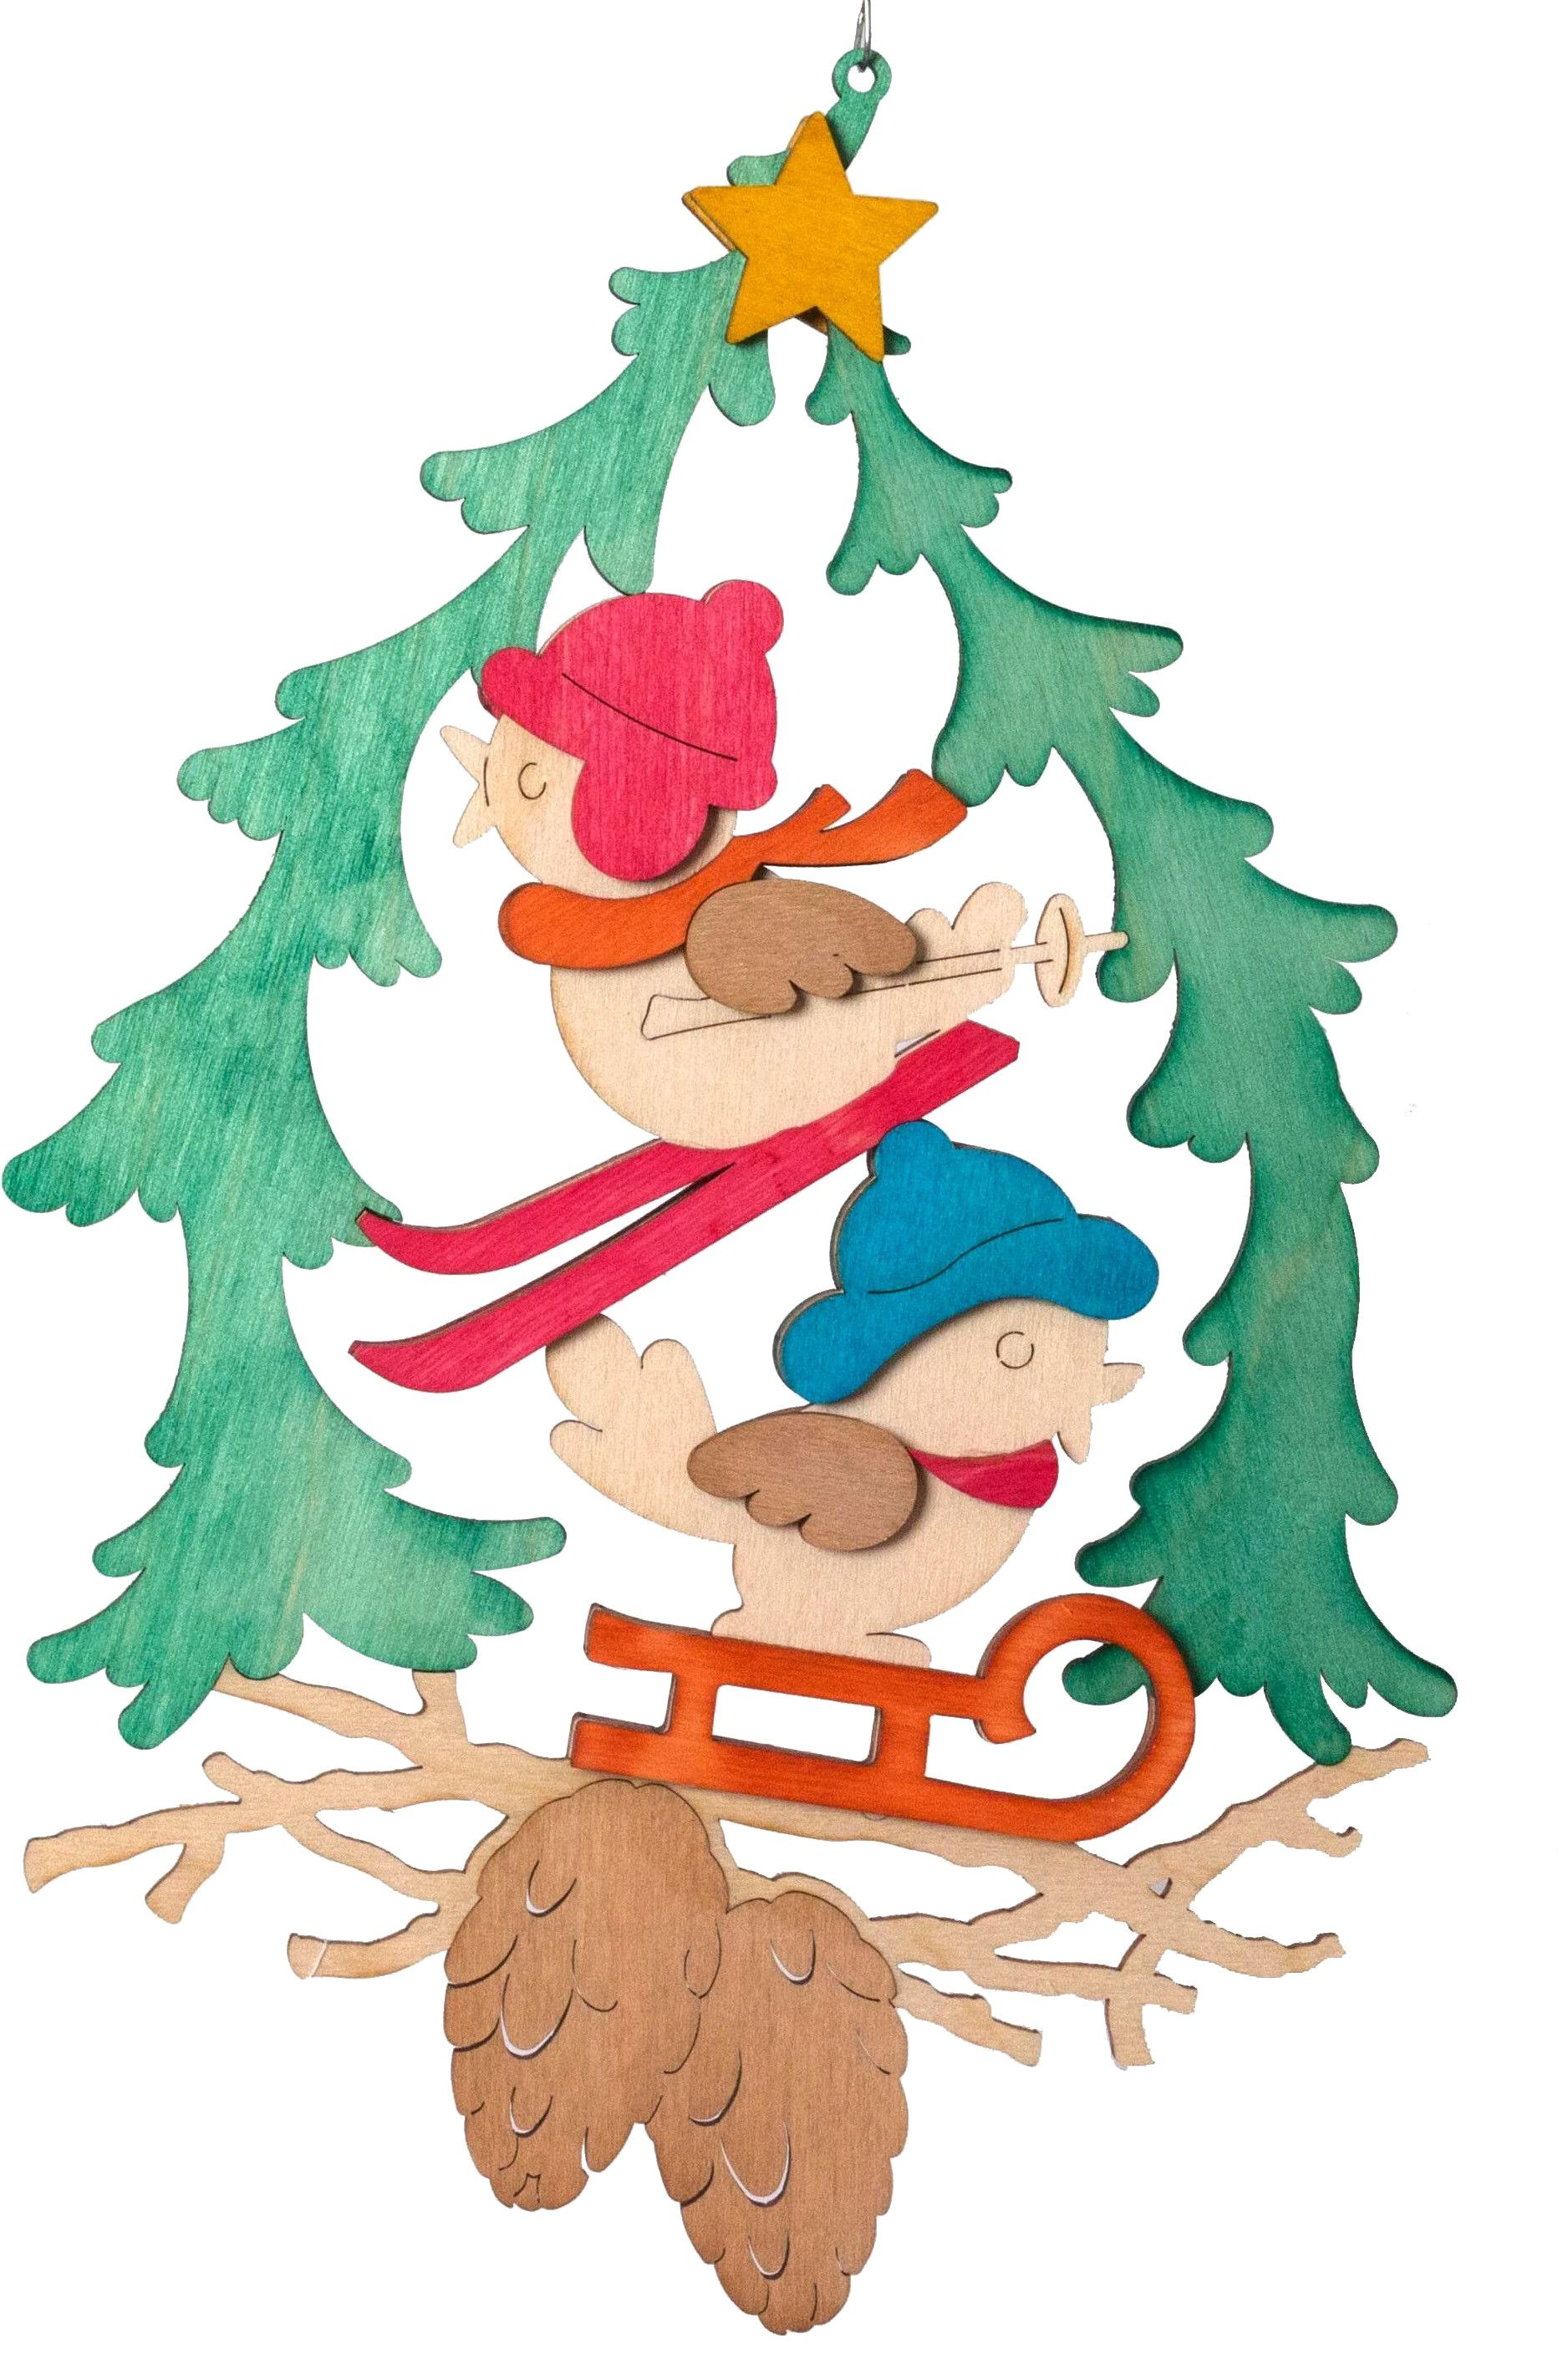 Weihnachtsbasteln Kinder.Kinder Basteln Bastelset Fensterbild Vögel Aus Holz